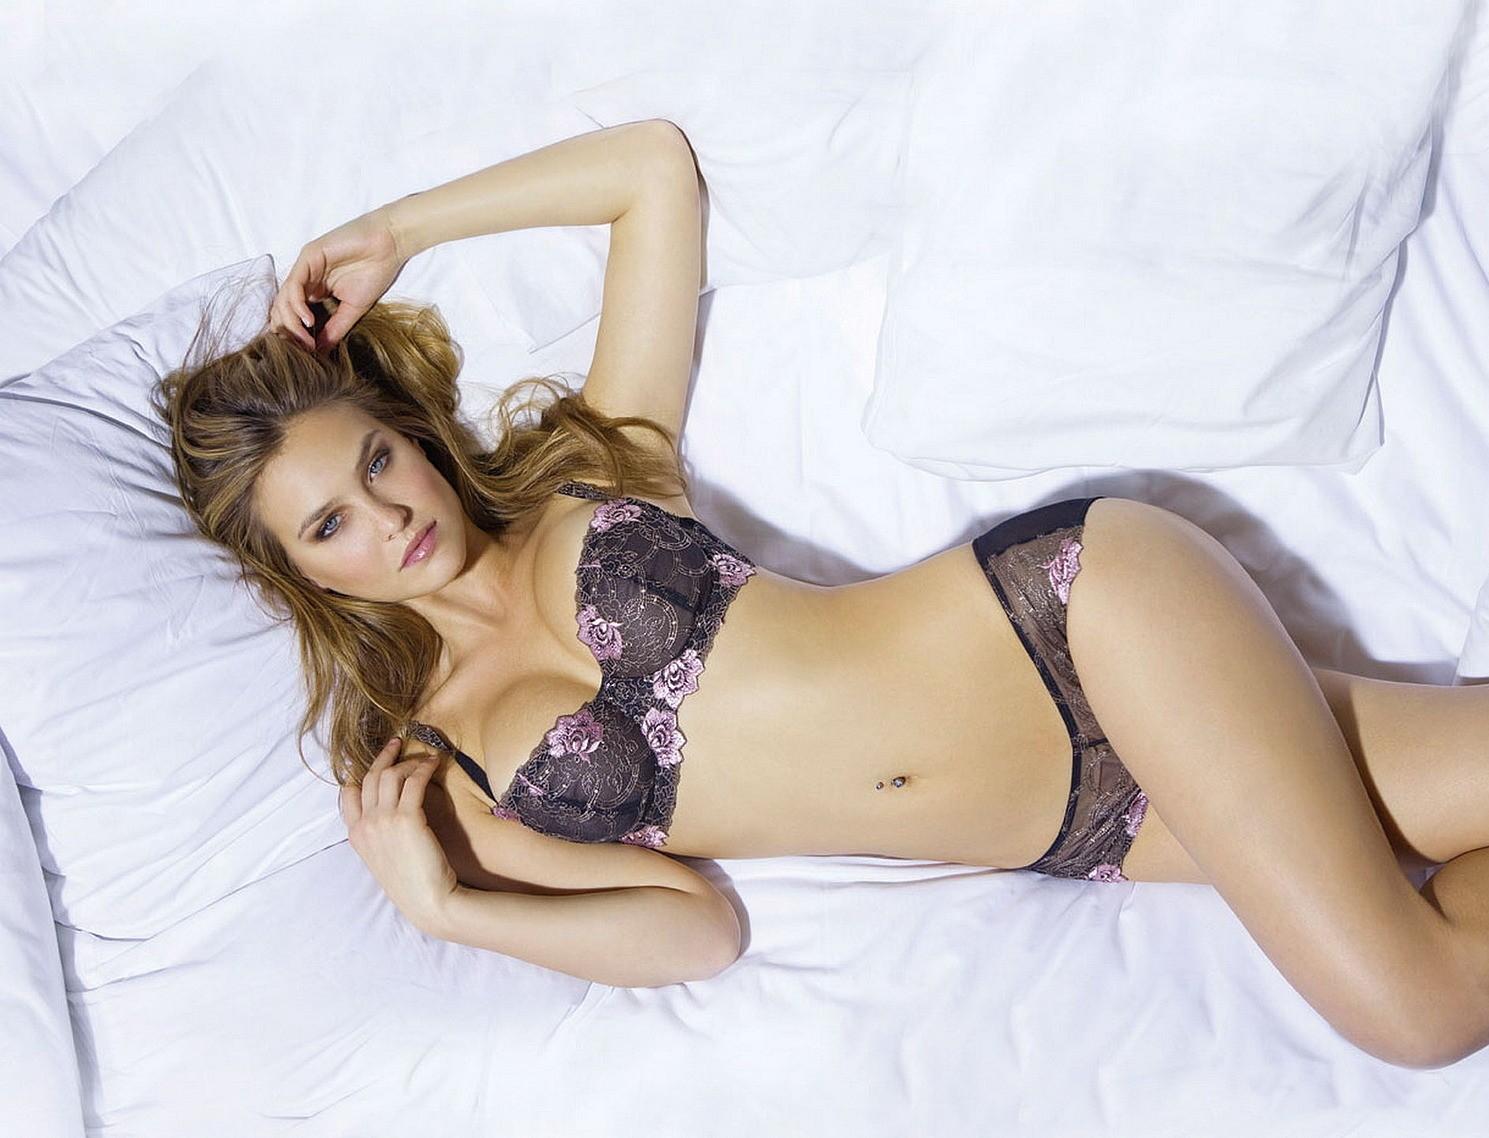 http://2.bp.blogspot.com/_zENnZobKPqM/TVFS6E3S-8I/AAAAAAAAC7I/kLQOD6YukkA/s1600/Bar+Refaeli++celebrity++hottie+in+lingerie.jpg